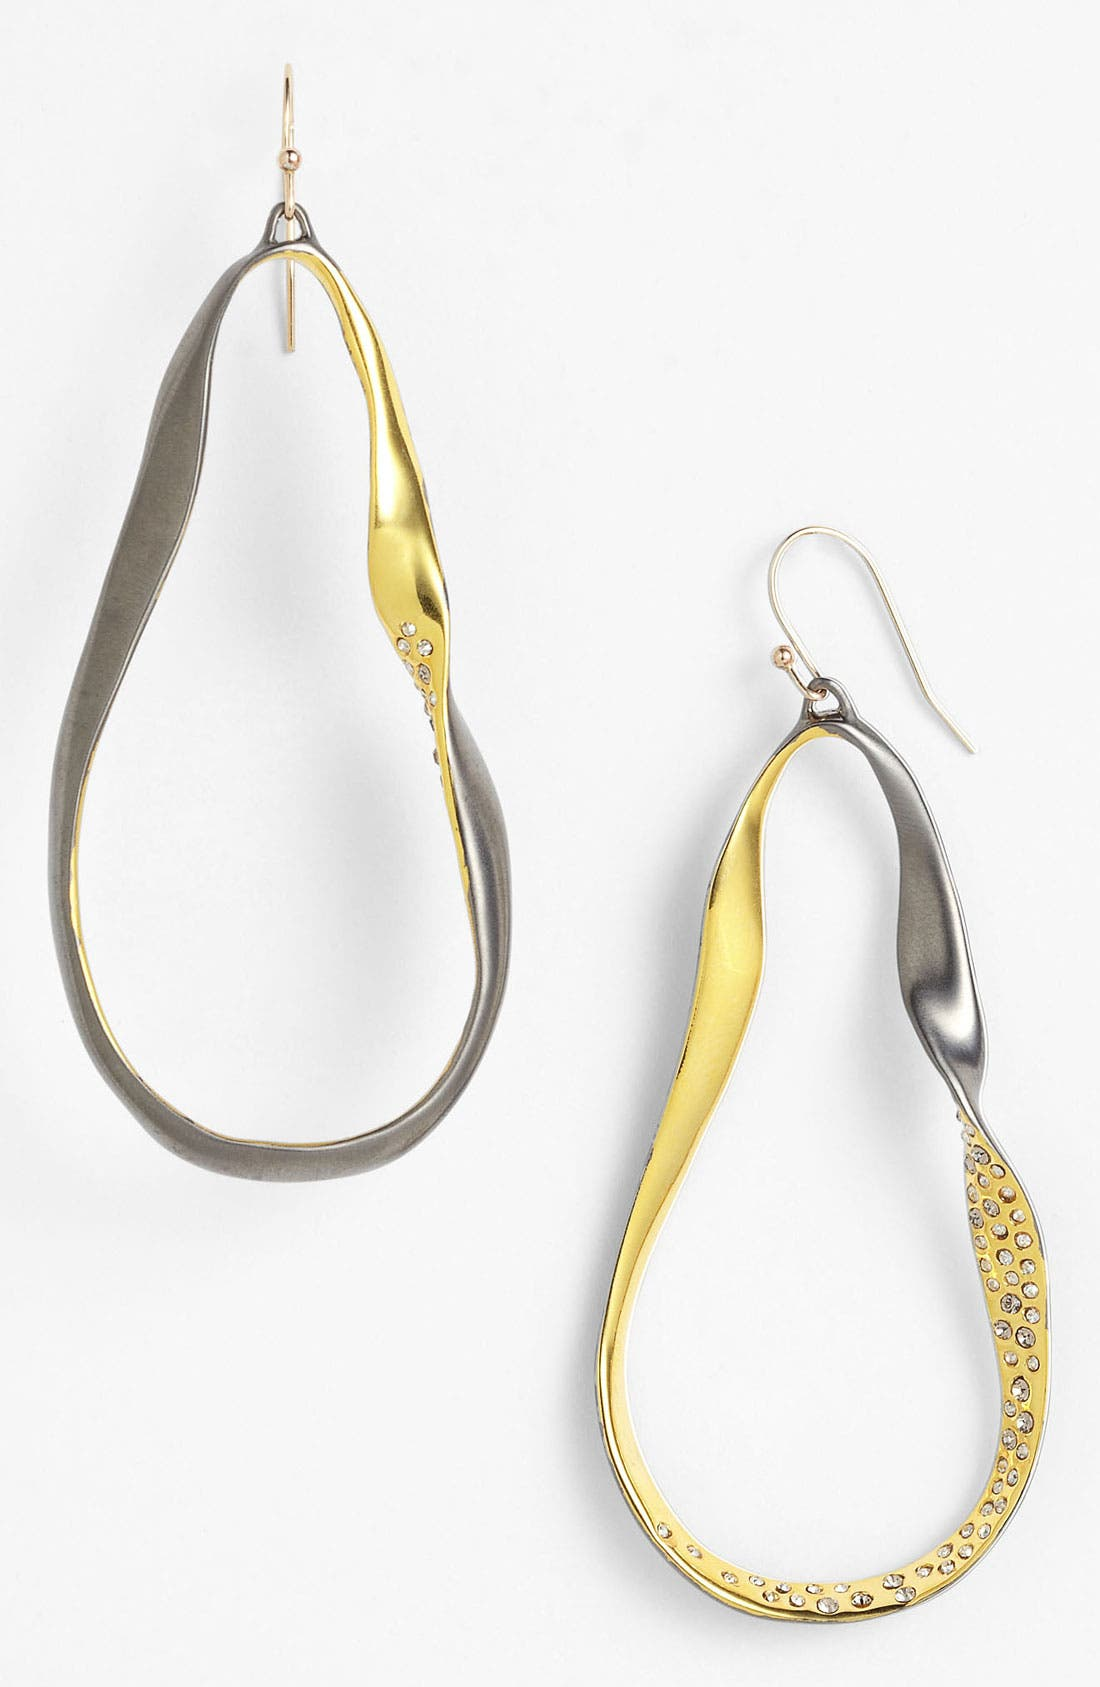 Main Image - Alexis Bittar 'Miss Havisham - Bel Air' Twisted Teardrop Earrings